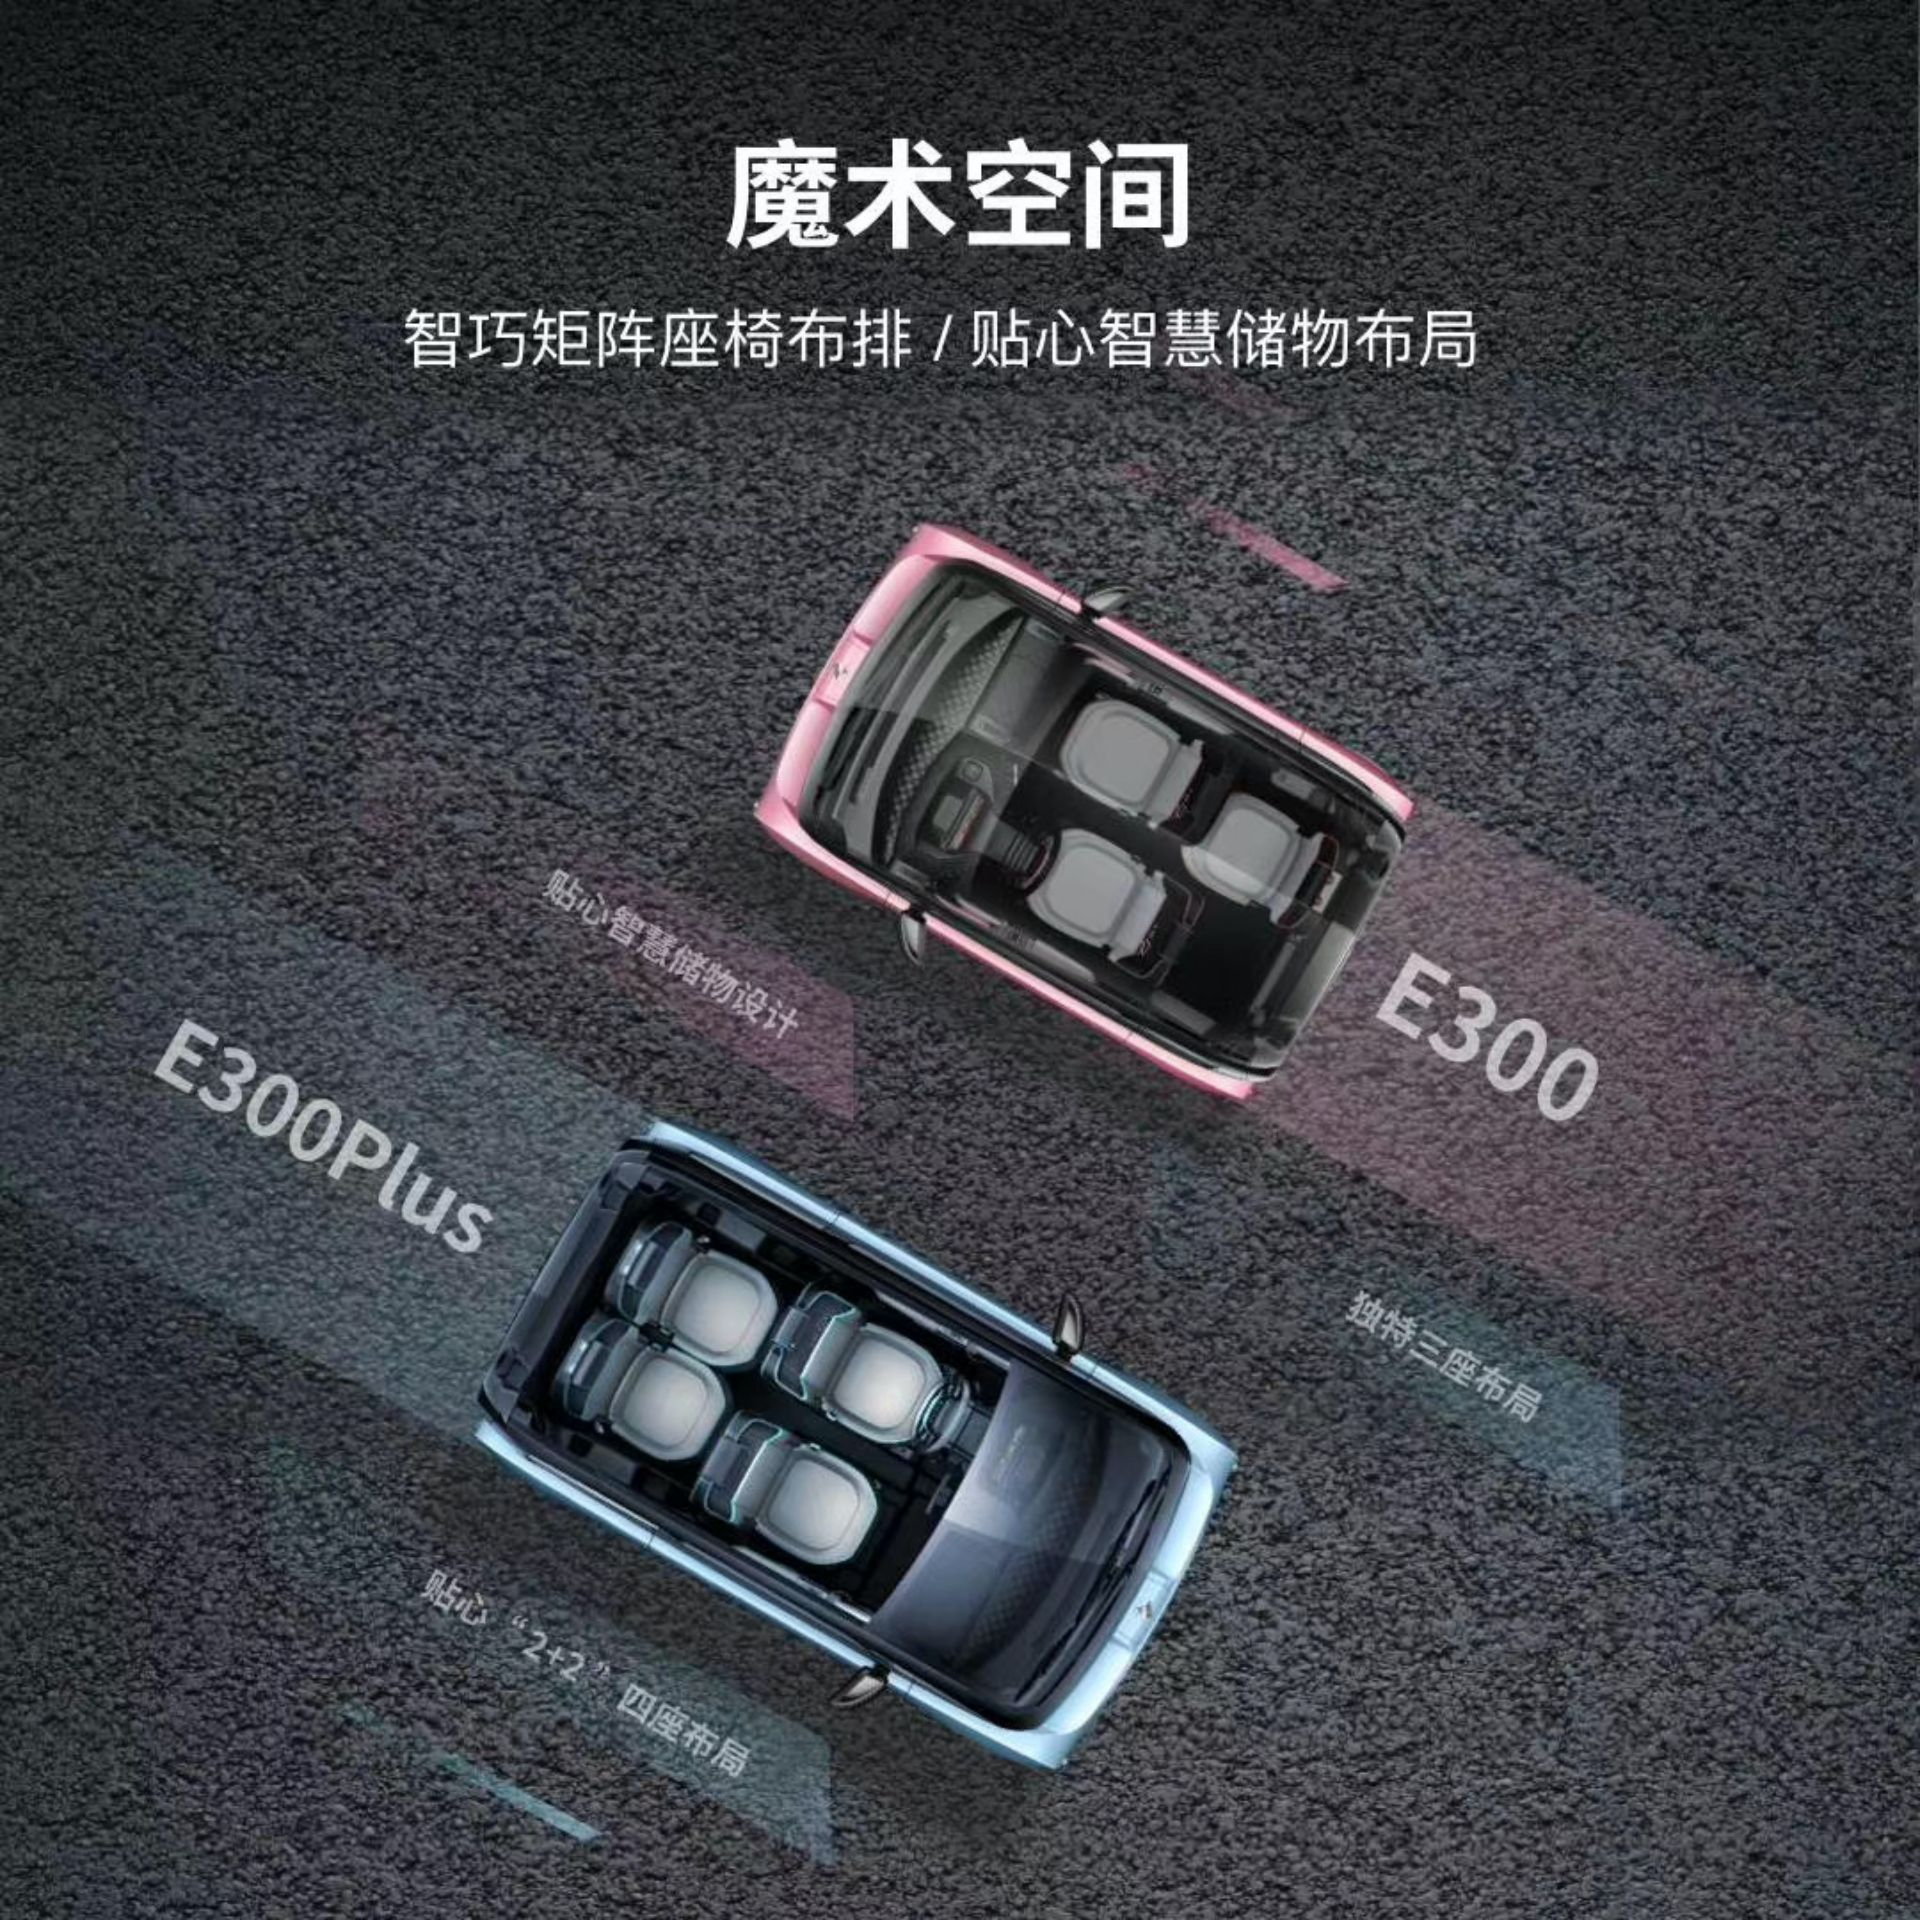 Baojun_E300_0003